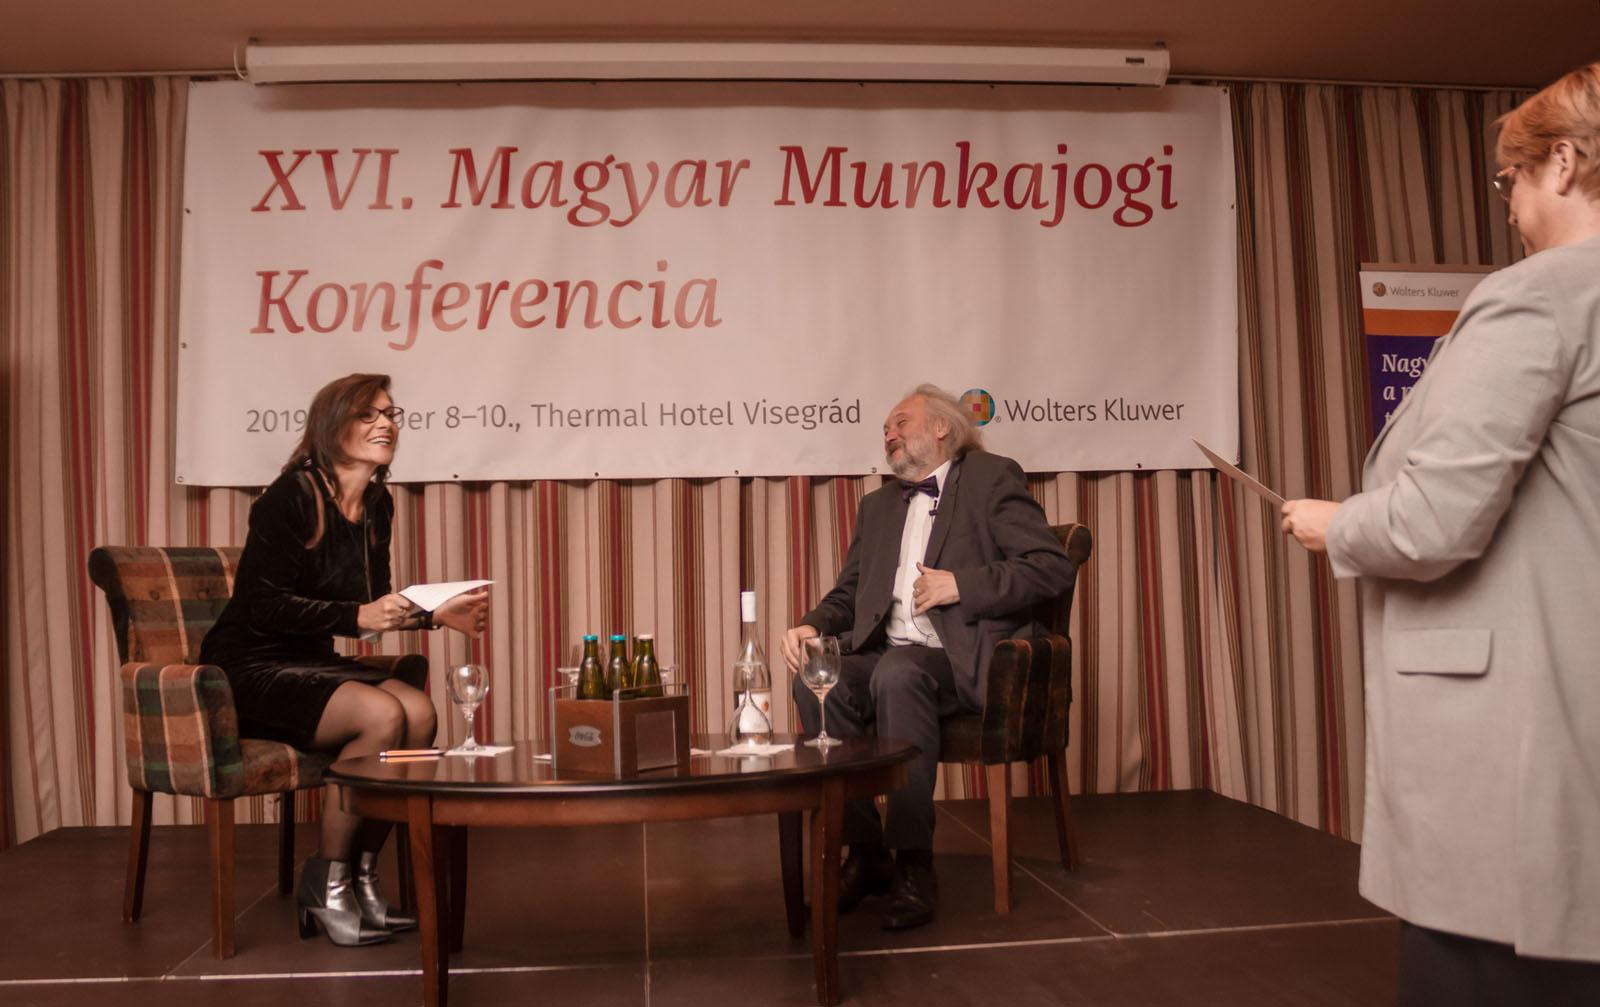 xvi-magyar-munkajogi-konferencia-berke-gyula